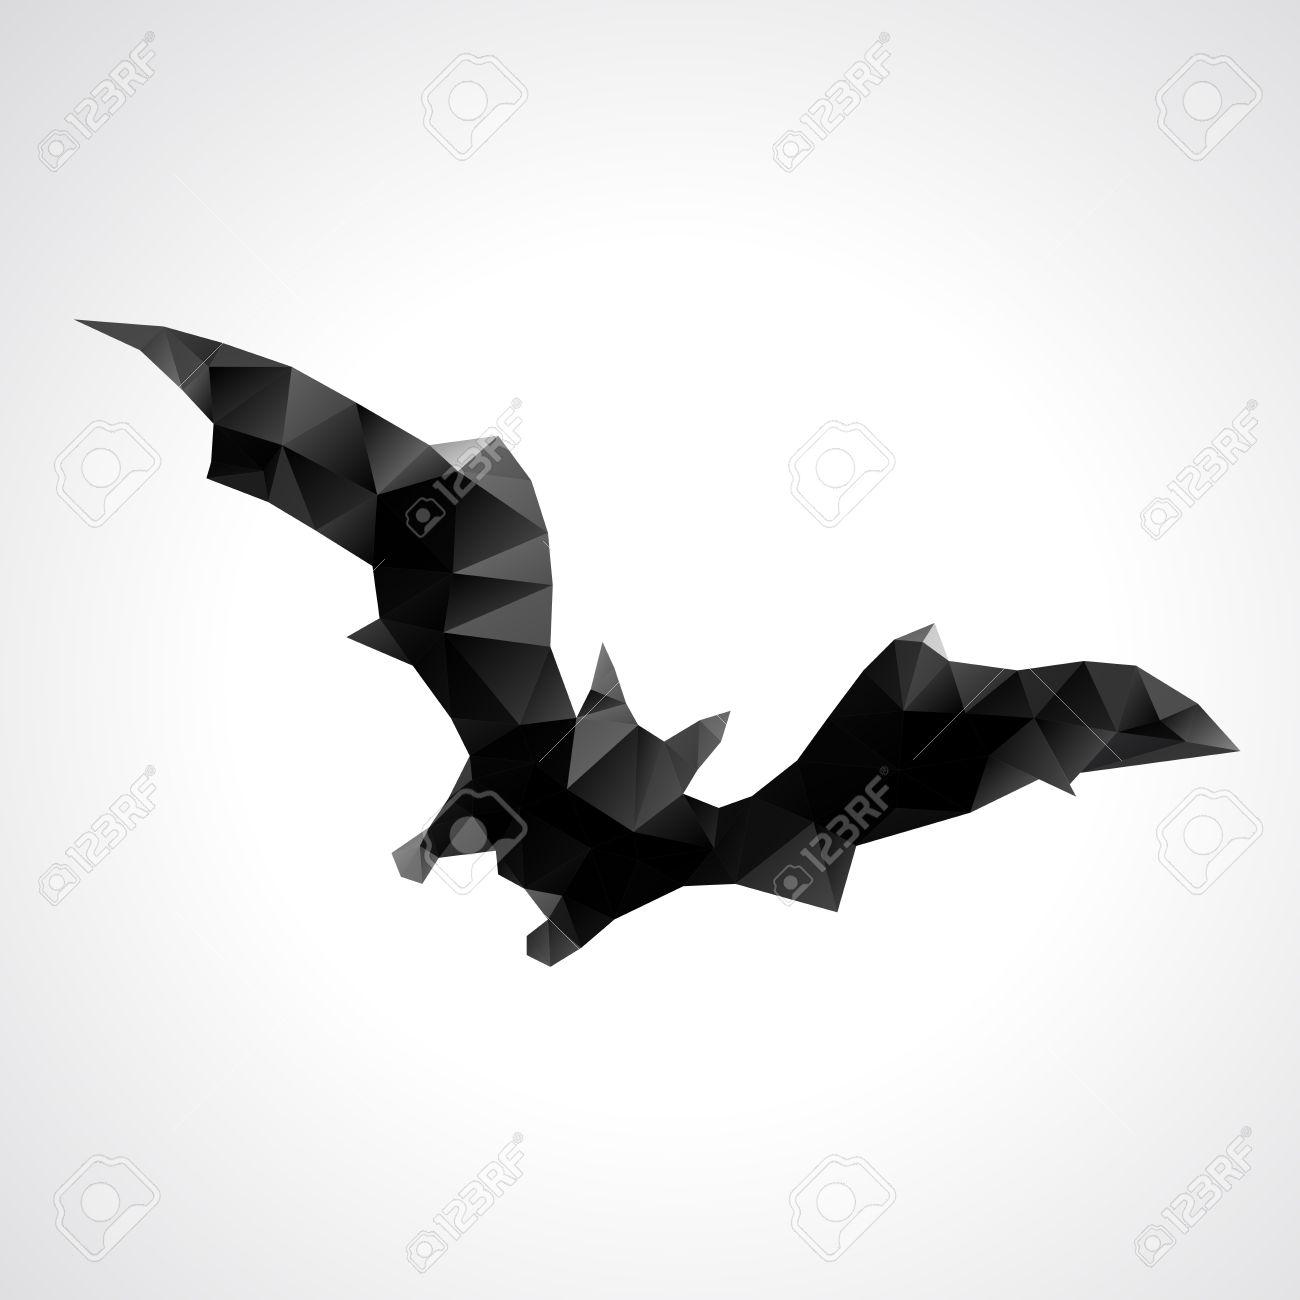 abstract geometric halloween bat vector illustration royalty